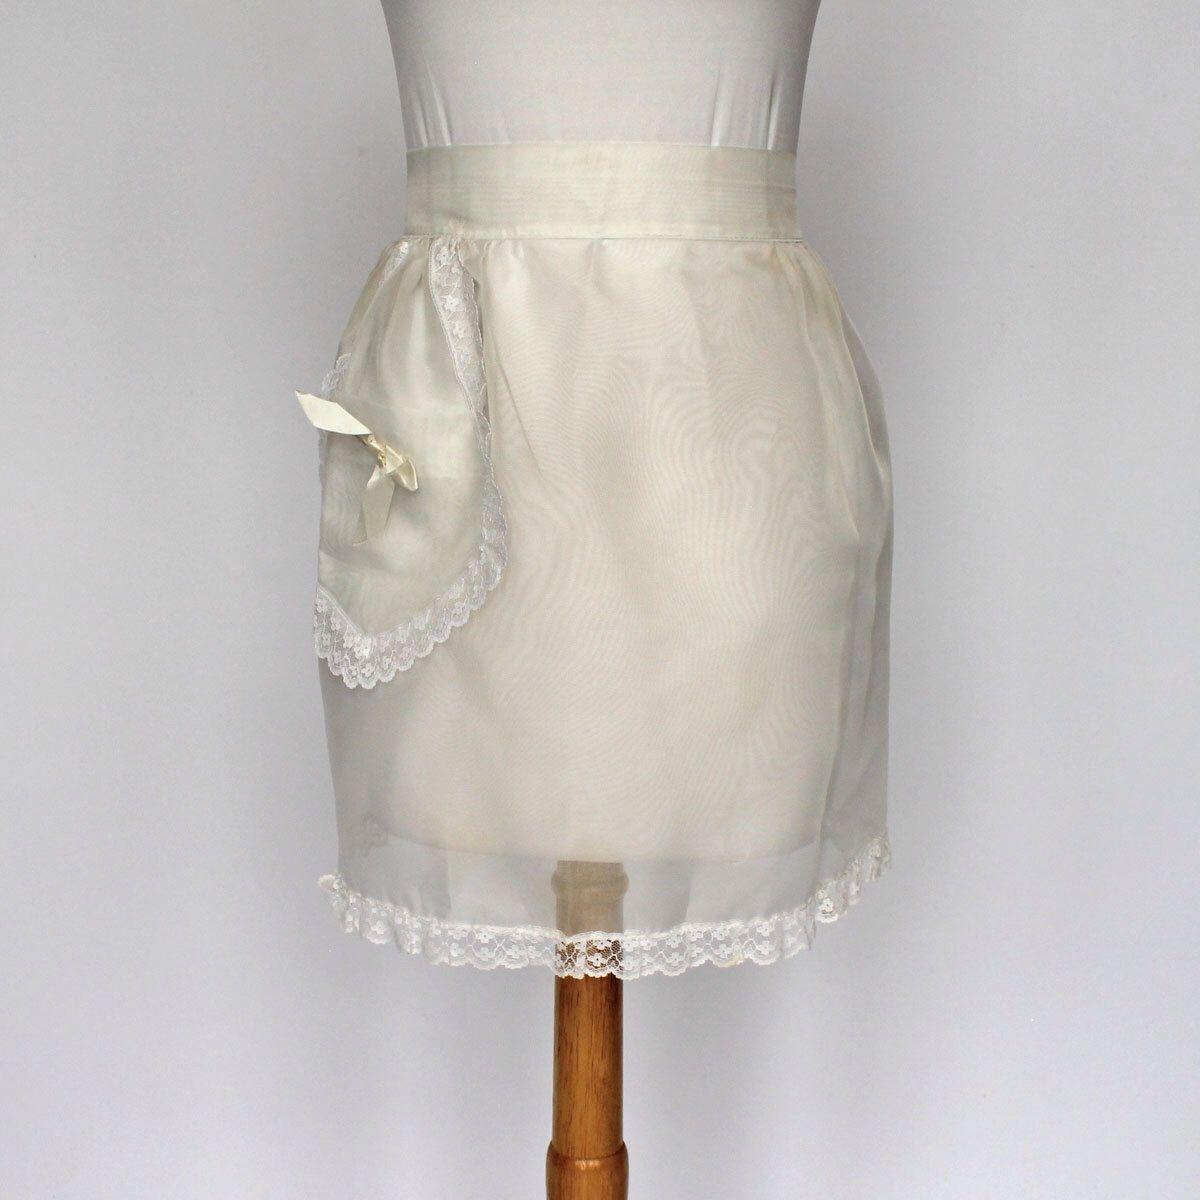 White apron lace trim - 50 S 60 S Sheer White Half Apron Lace Trim Pocket Bride Apron